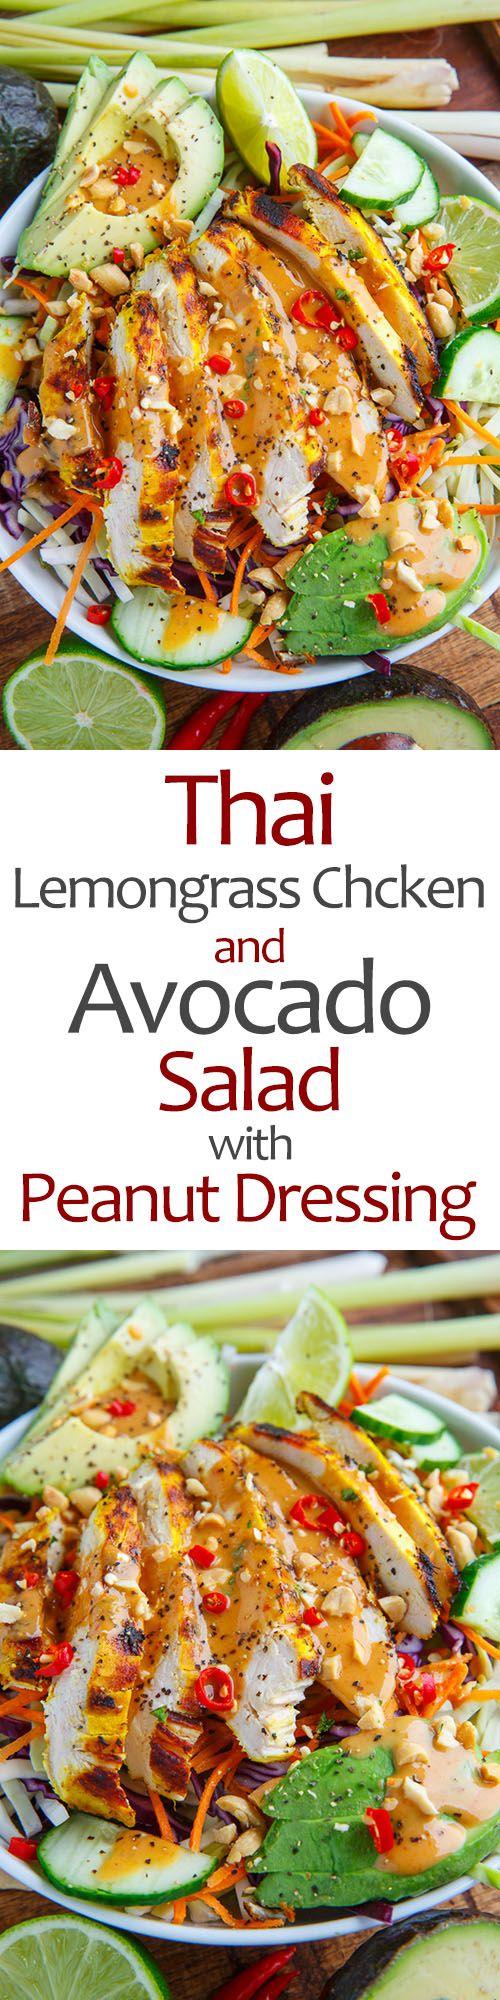 Thai Lemongrass Chicken and Avocado Salad with Spicy Peanut Dressing